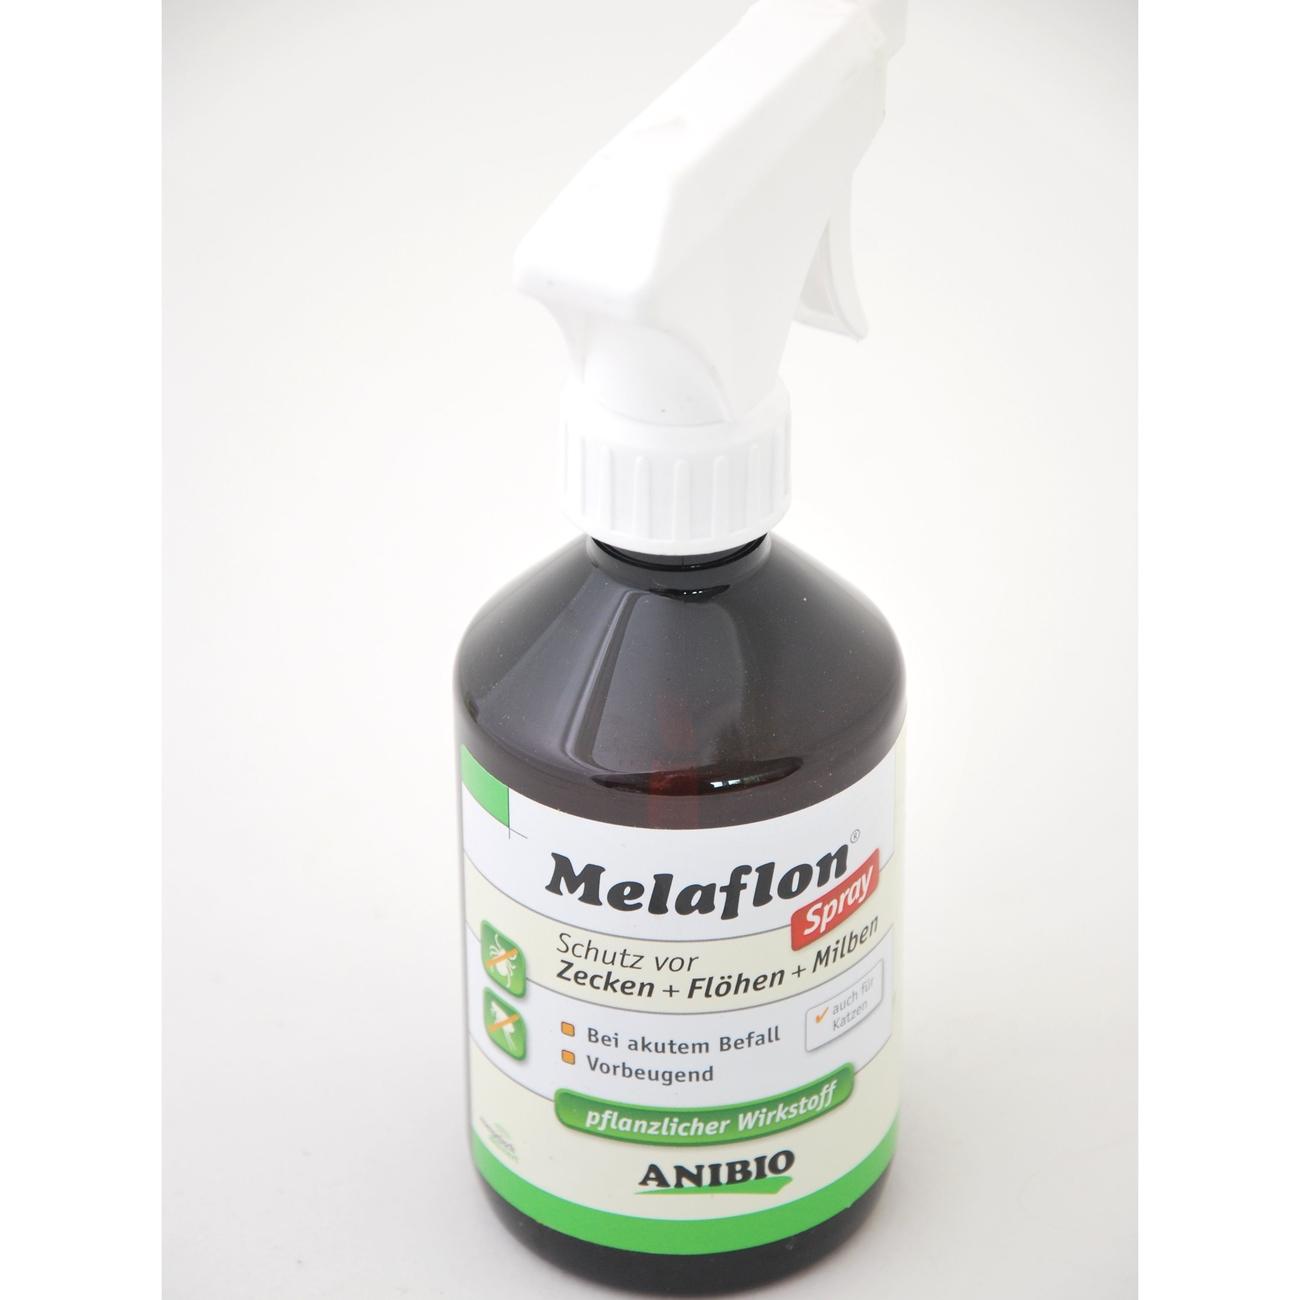 Anibio Melaflon Spray, 300 ml, mit Sprühpistole